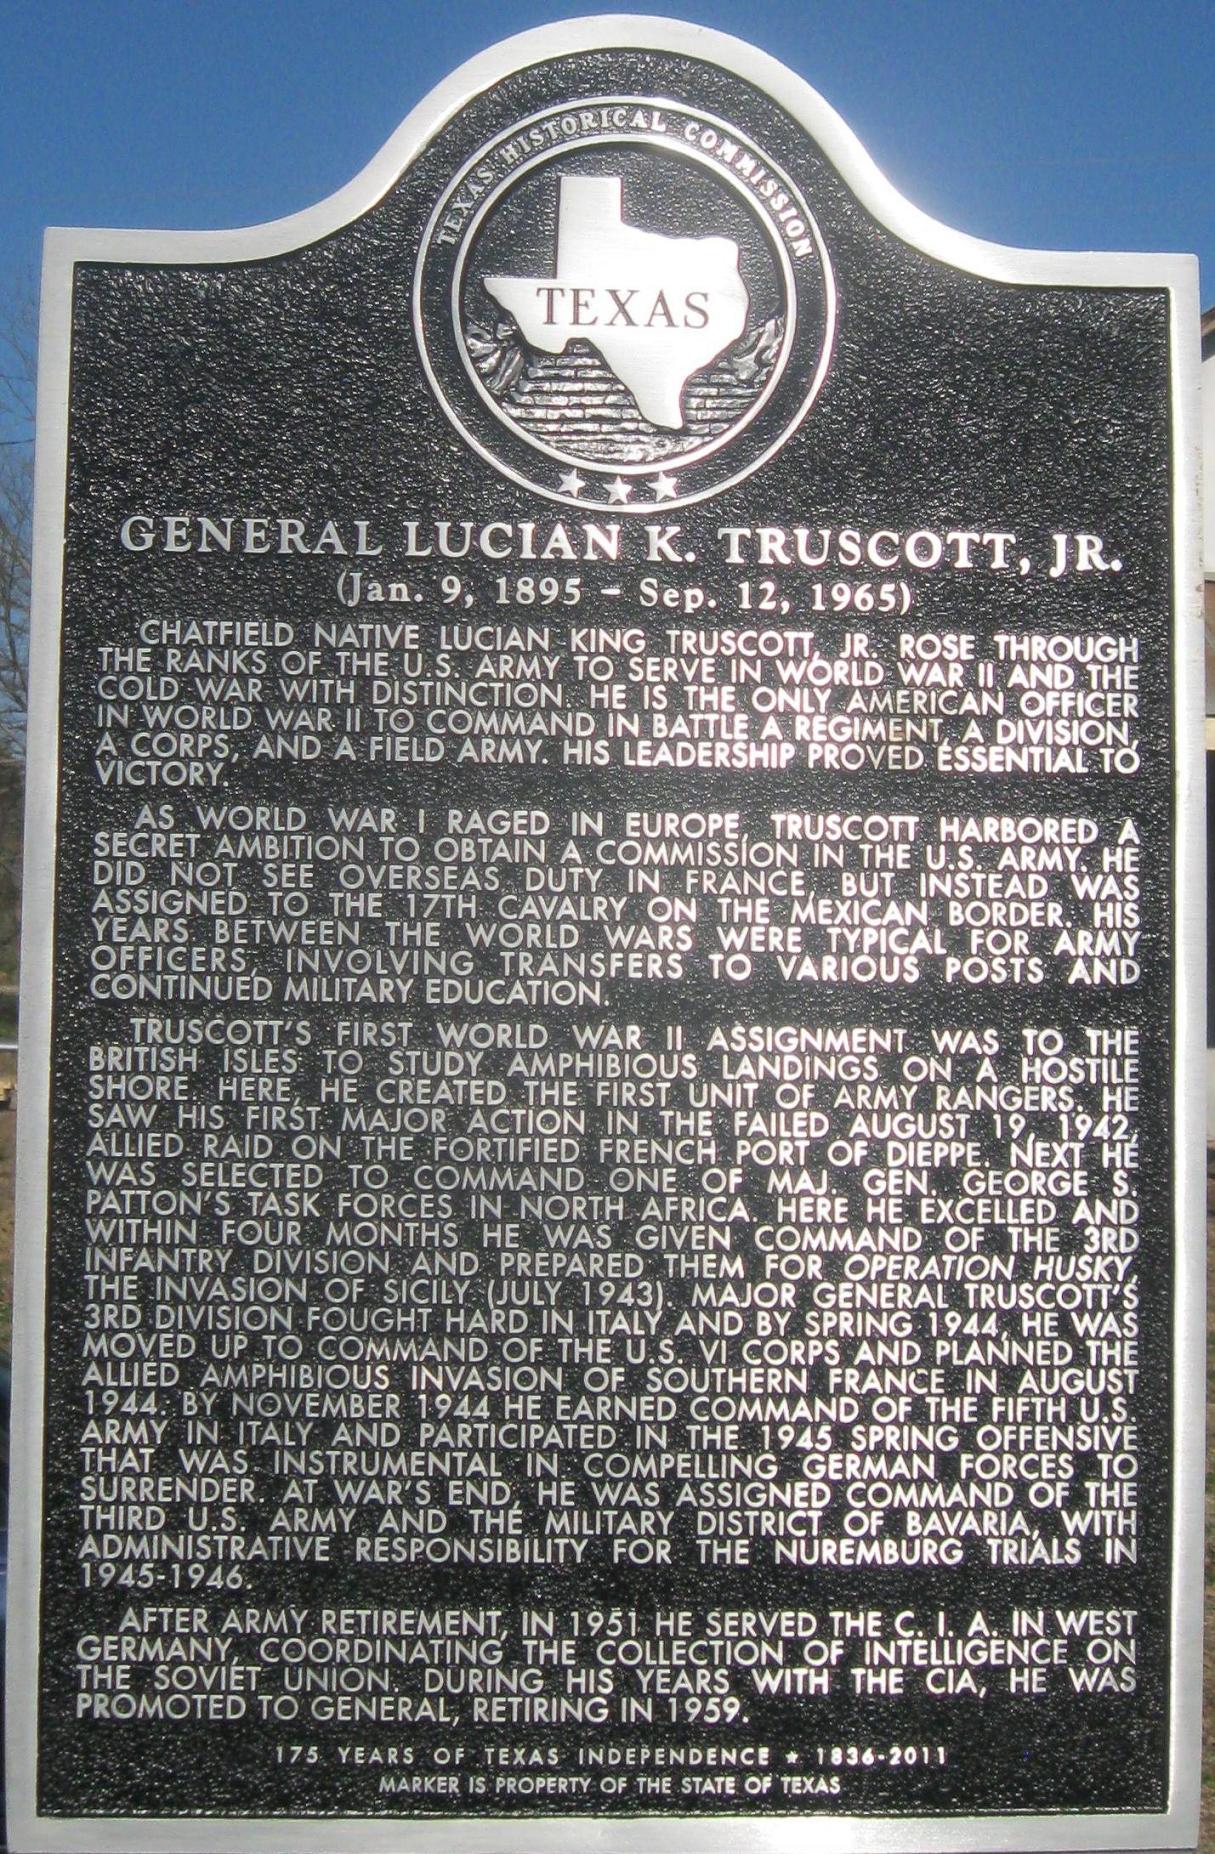 Gen. Truscott Hist. Marker